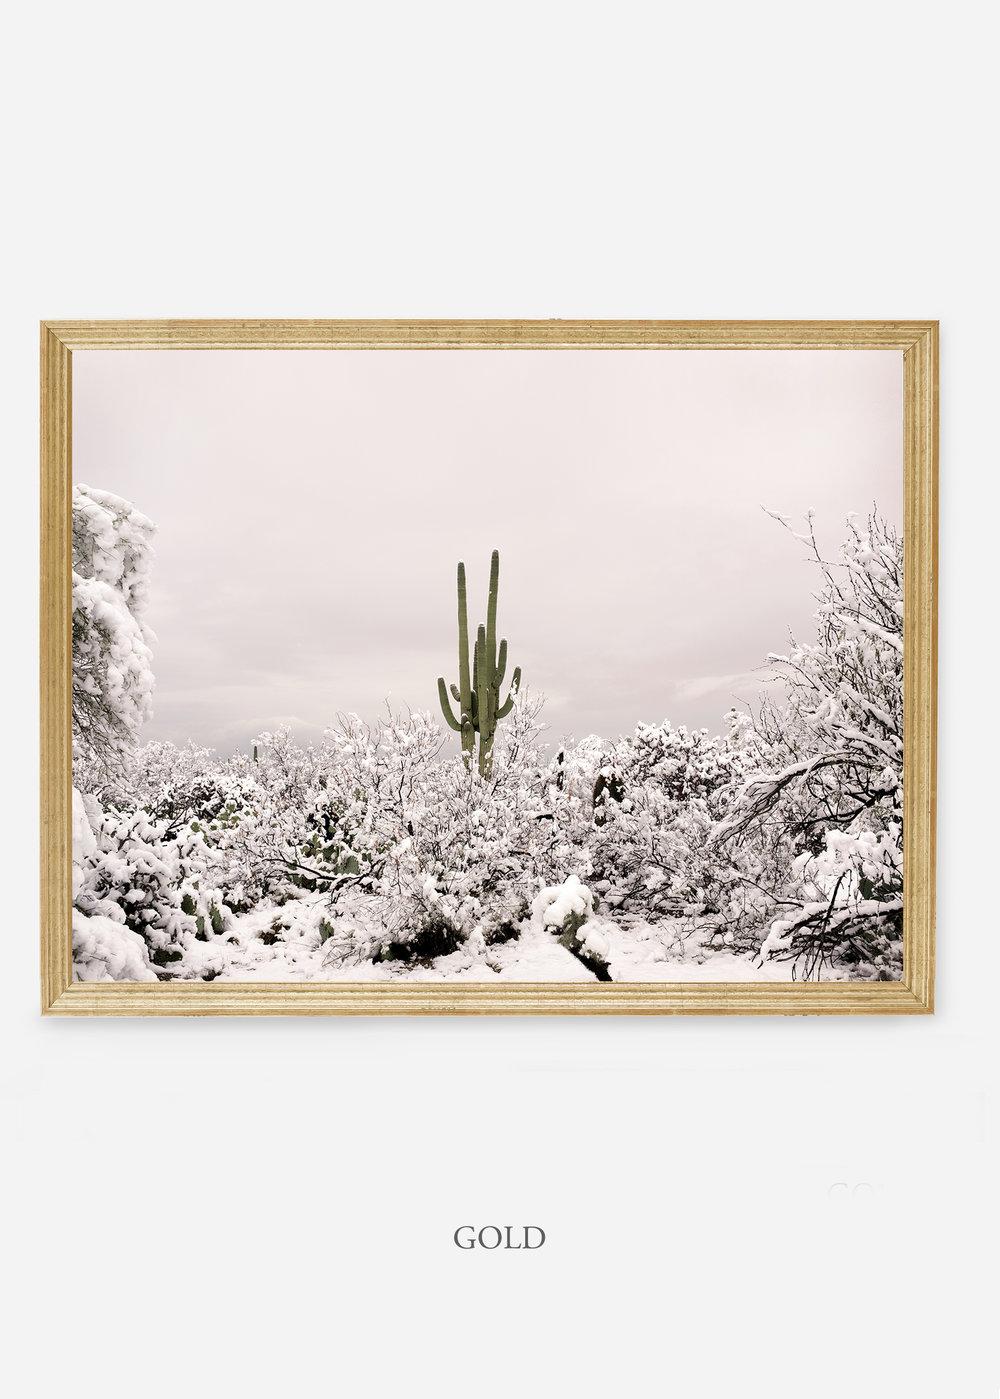 nomat-goldframe-saguaroNo.1-wildercalifornia-art-wallart-cactusprint-homedecor-prints-arizona-botanical-artwork-interiordesign.jpg